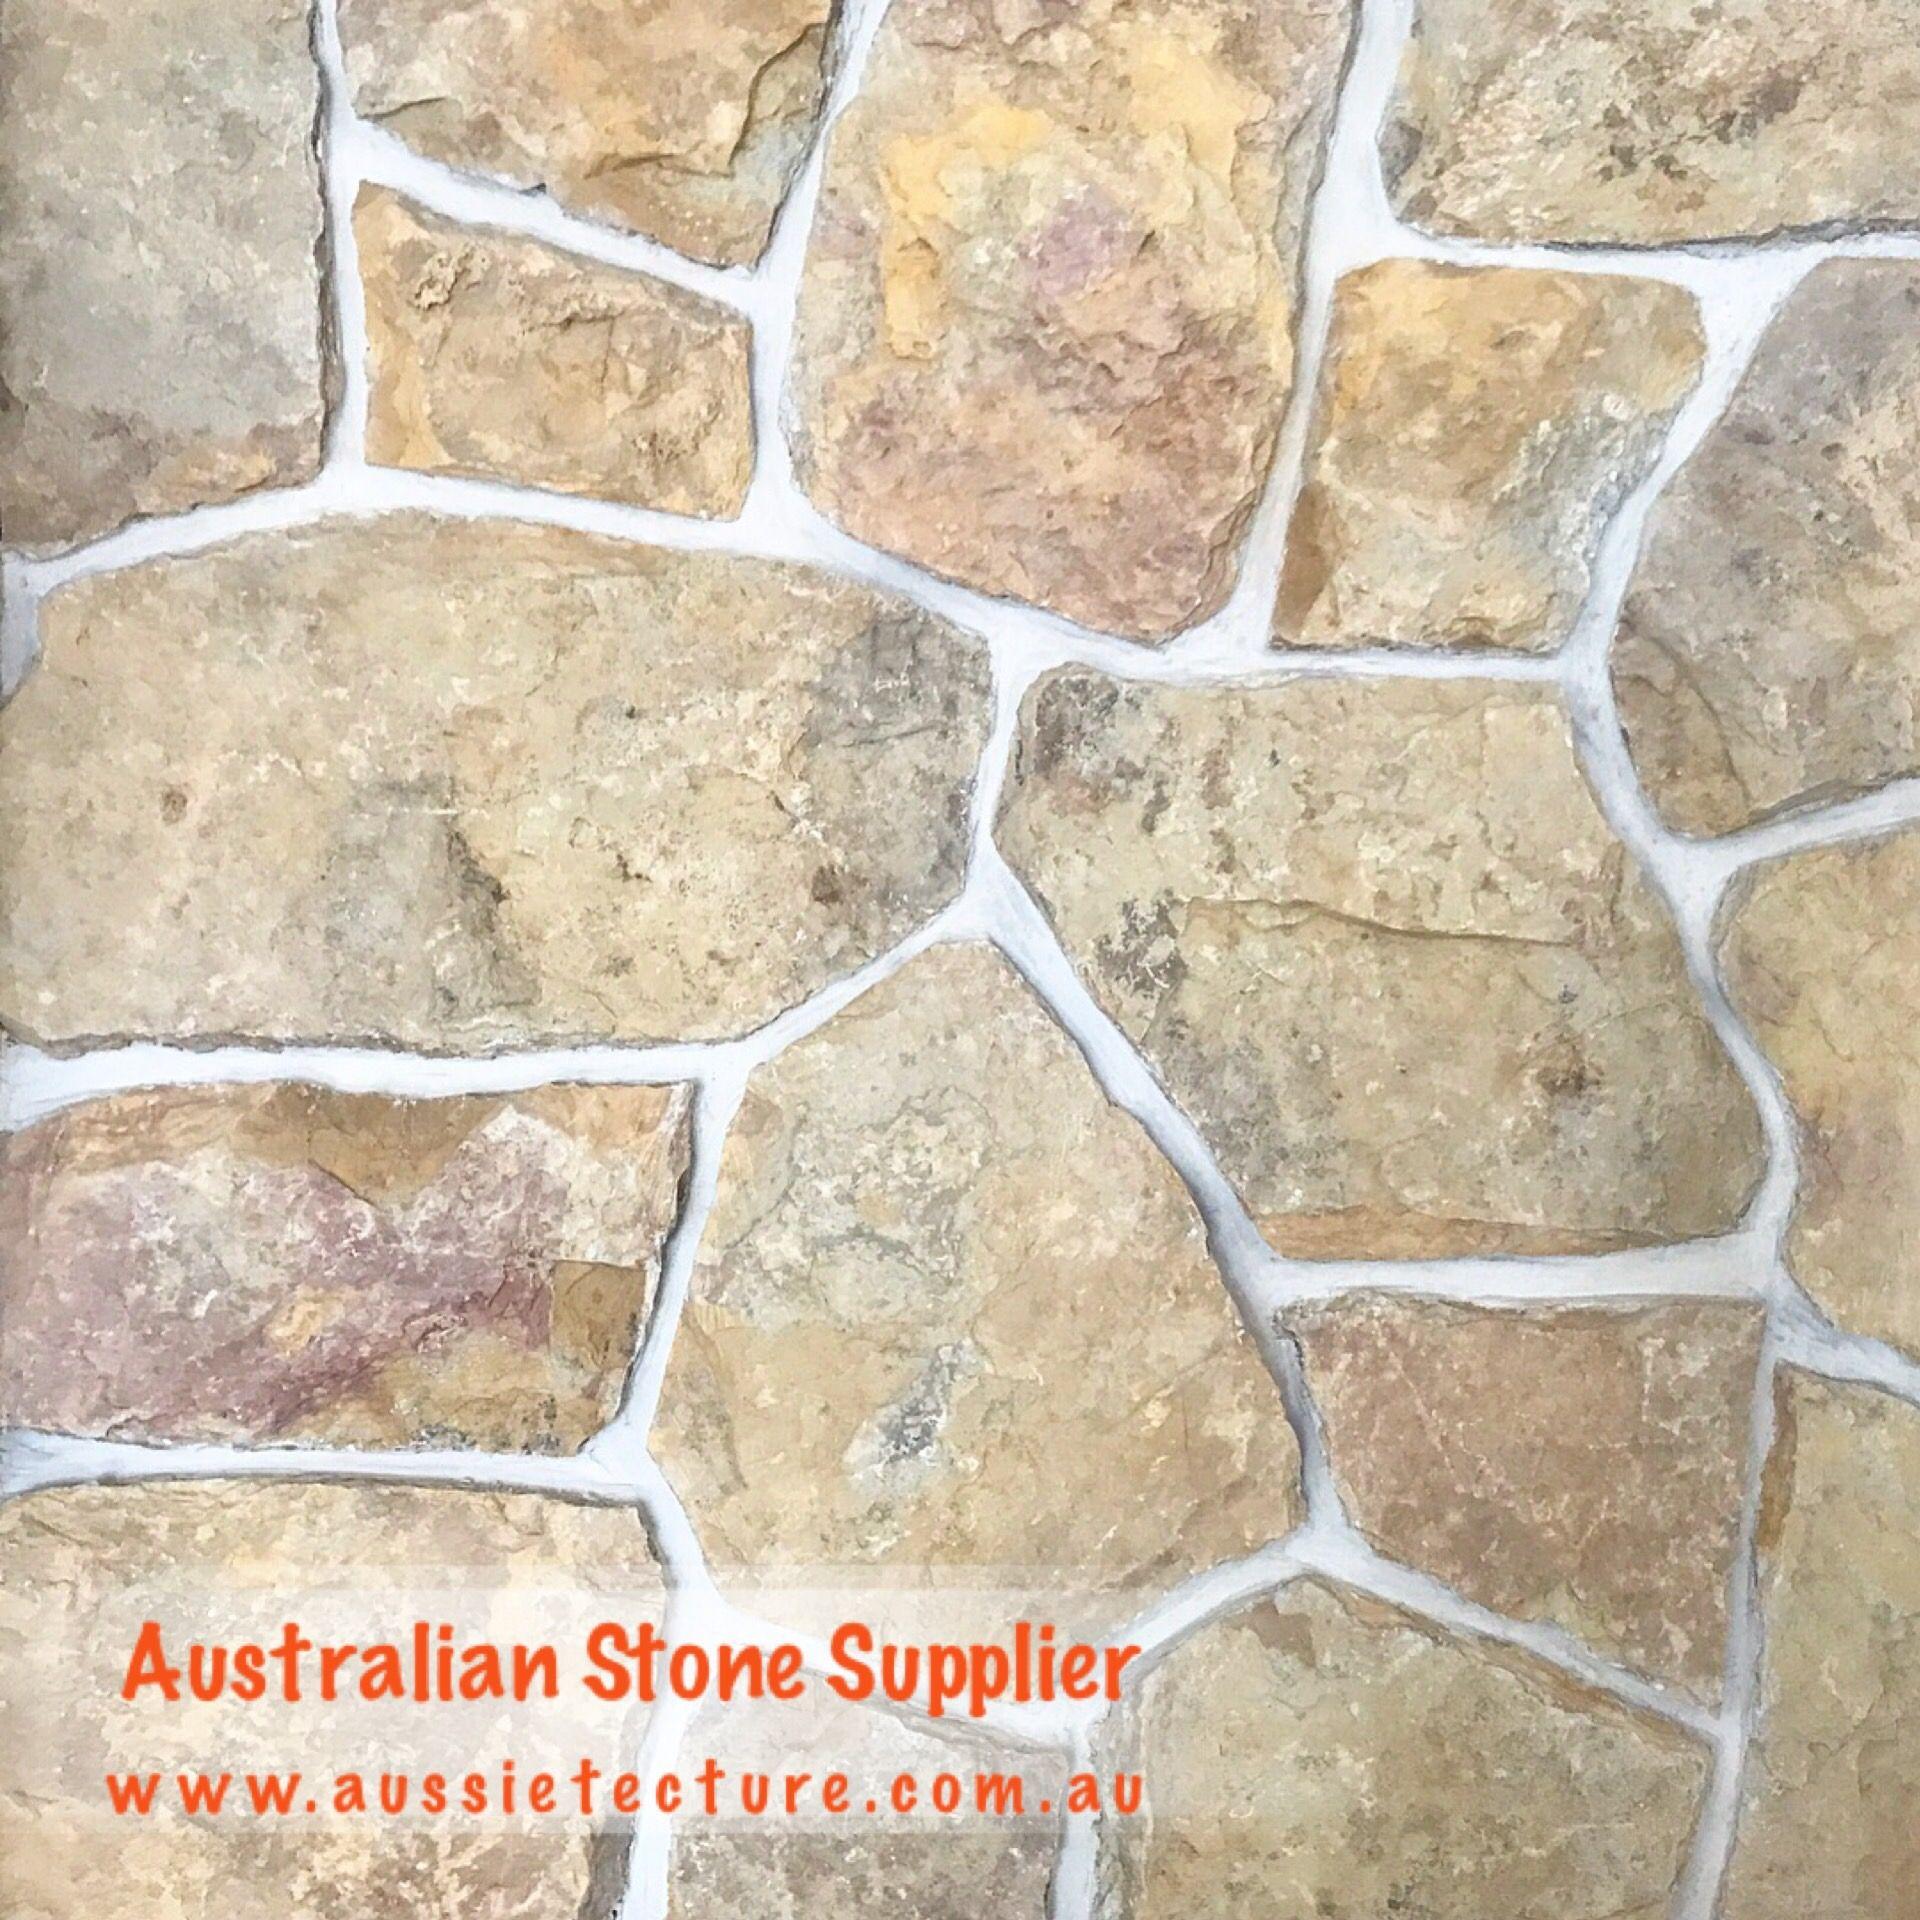 Stone Wall Stone Cladding Stone Walls Stone Walling Sone Wall Cladding Sandstone Stone Cladding Architects Exterior Interior De Stone Cladding Natural Stone Wall Stone Supplier